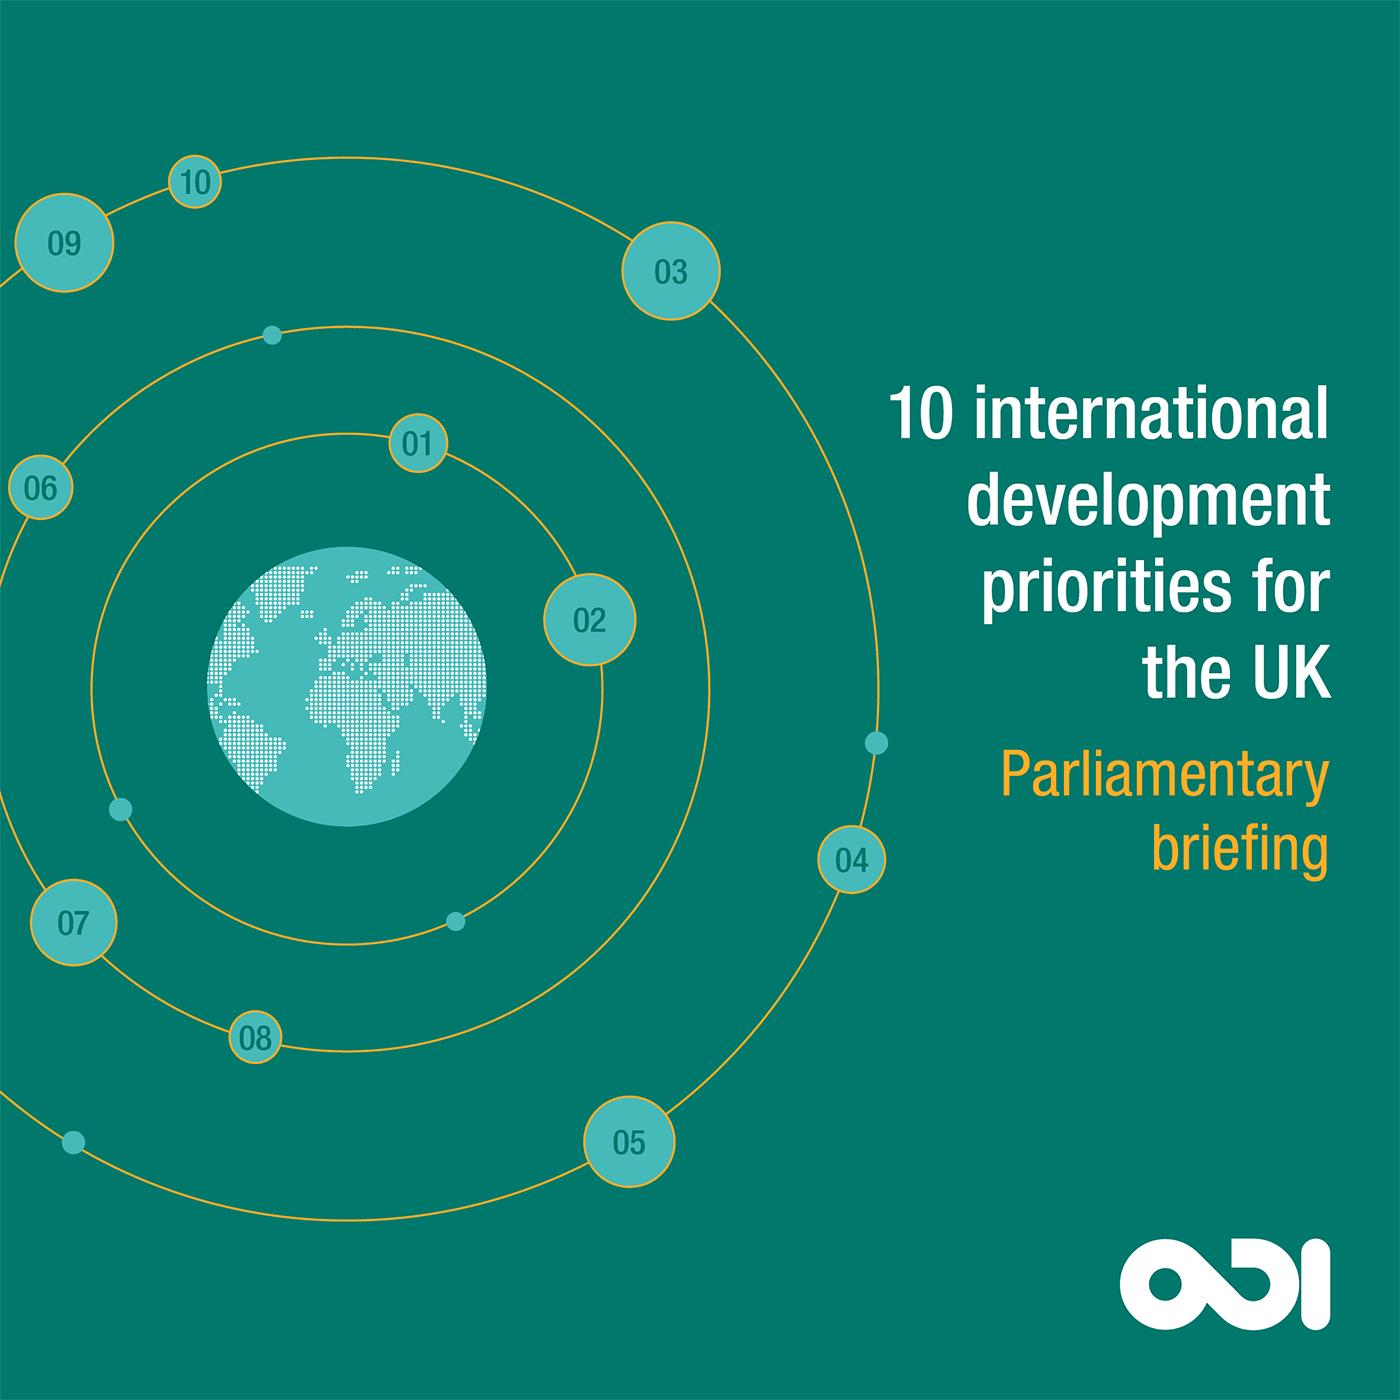 10 development priorities for the UK